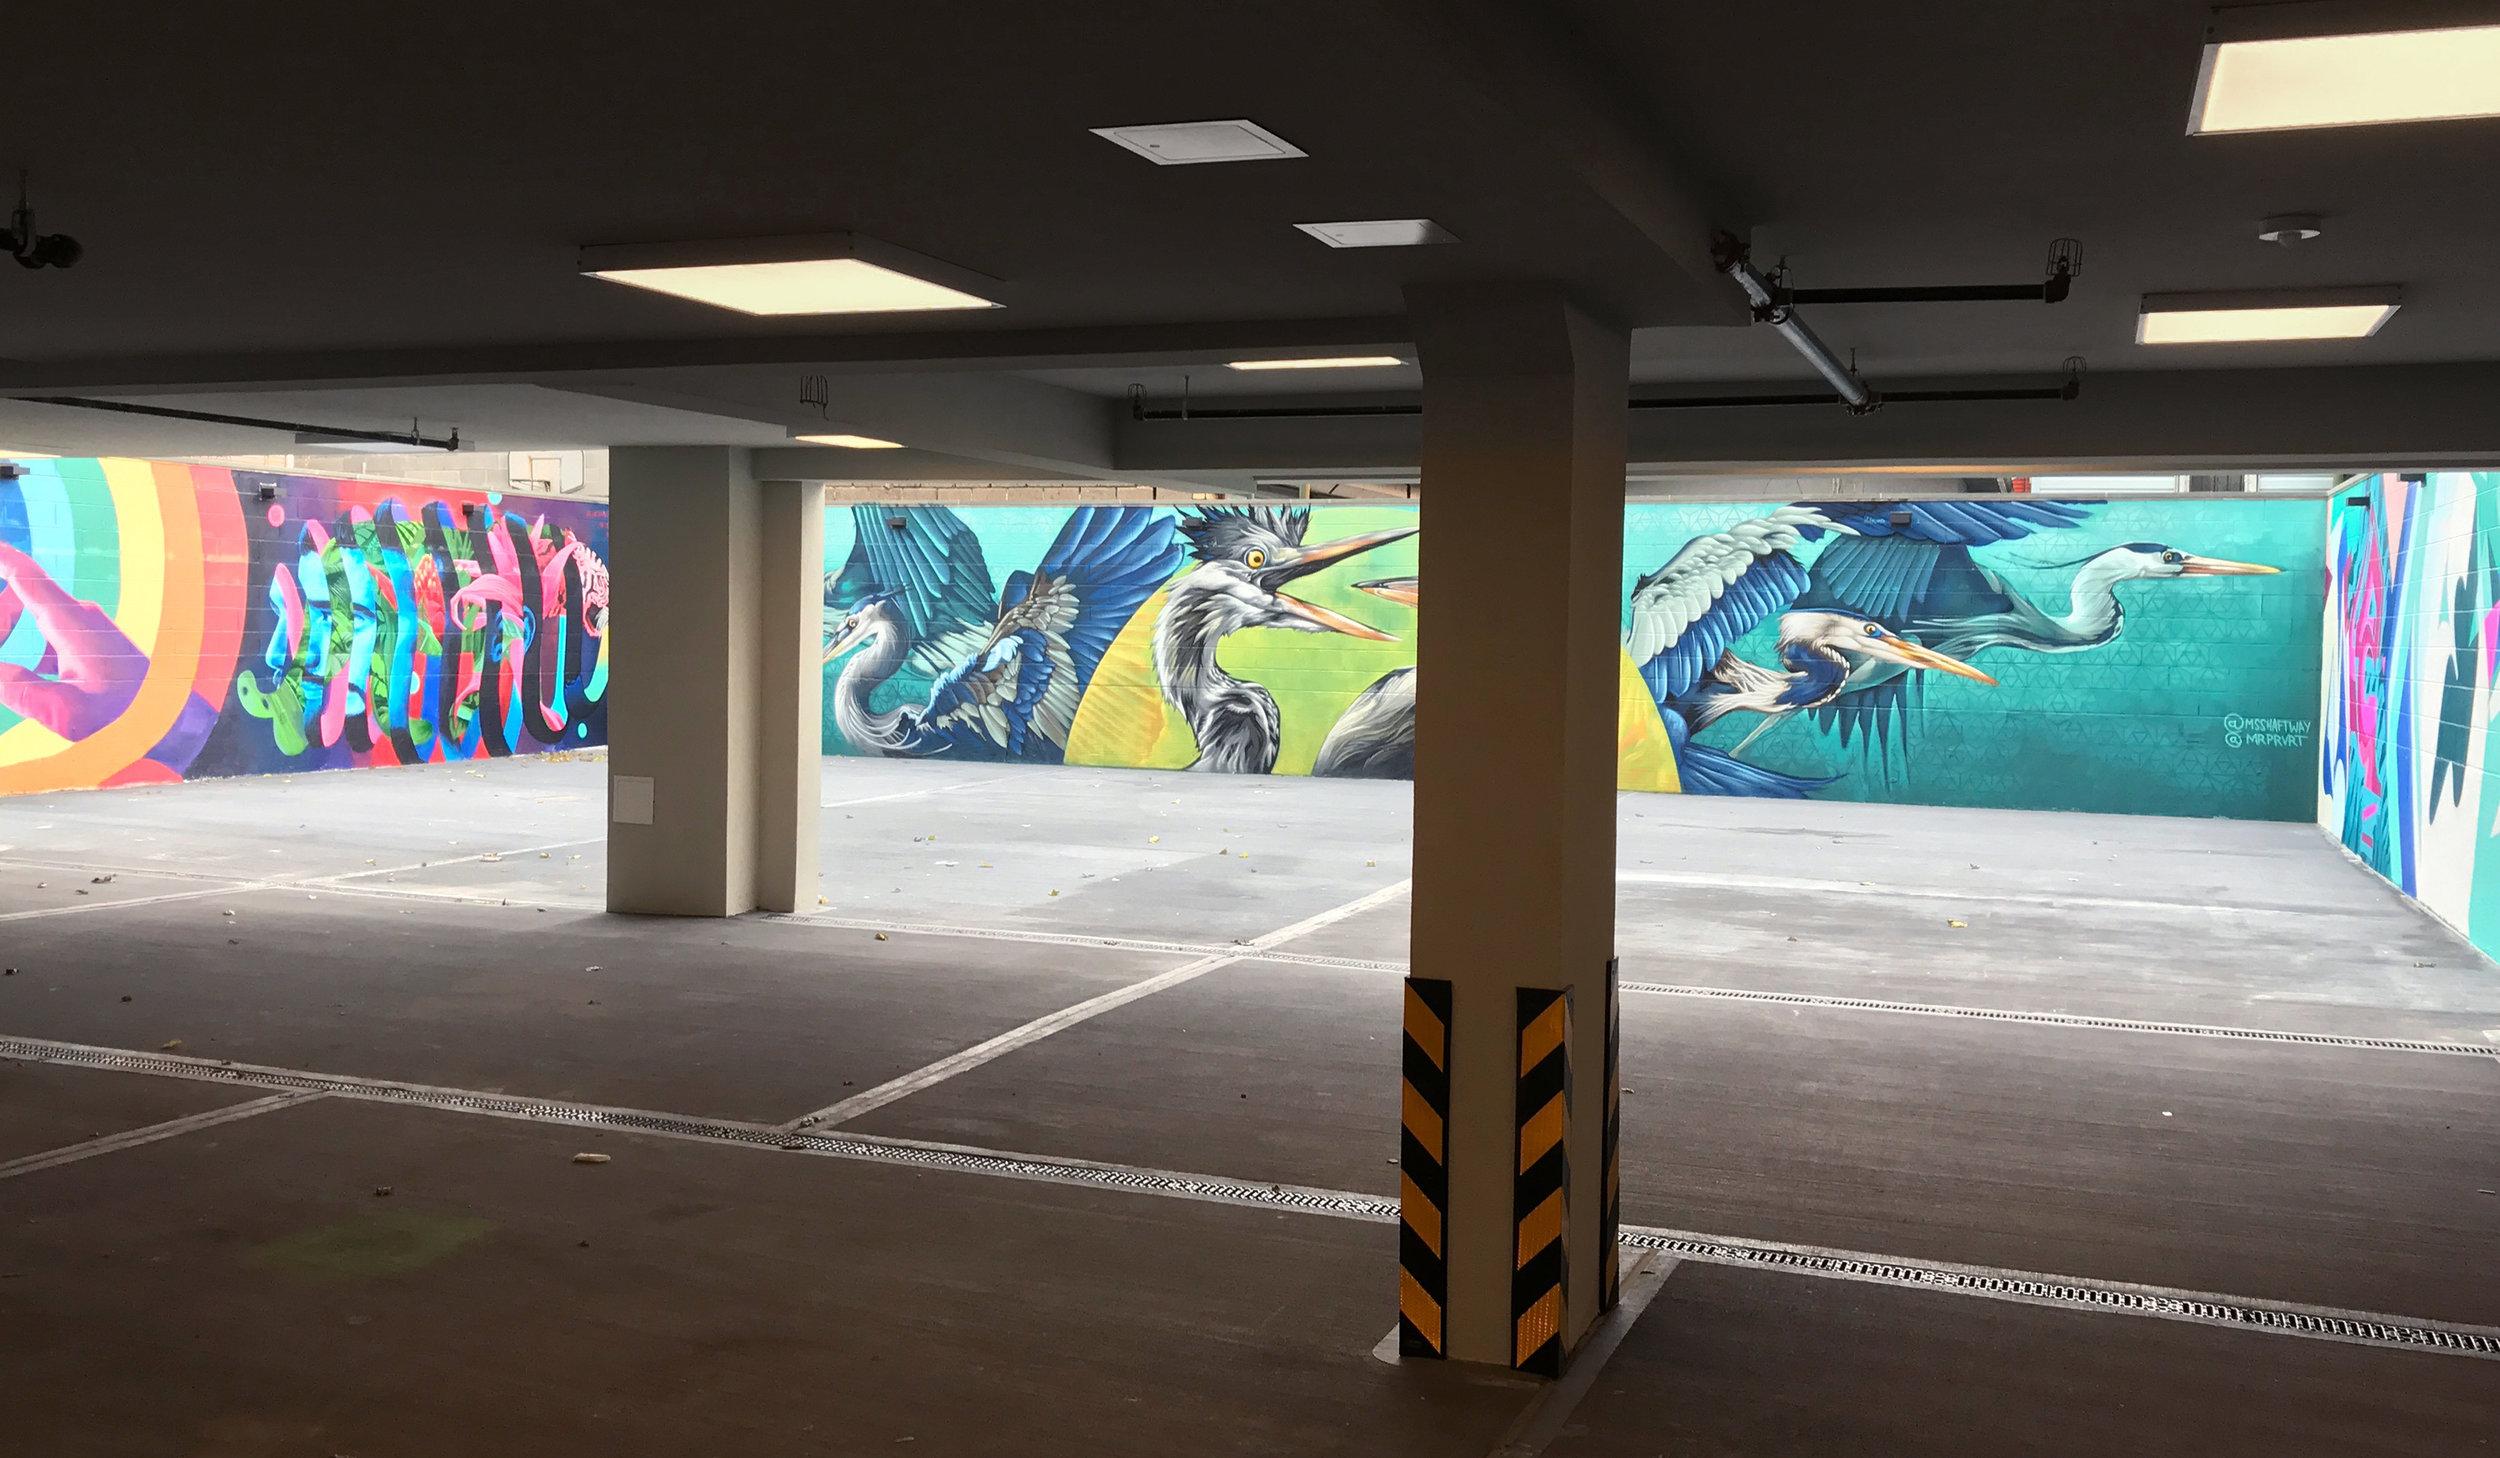 graffiti-house-parking2.jpg